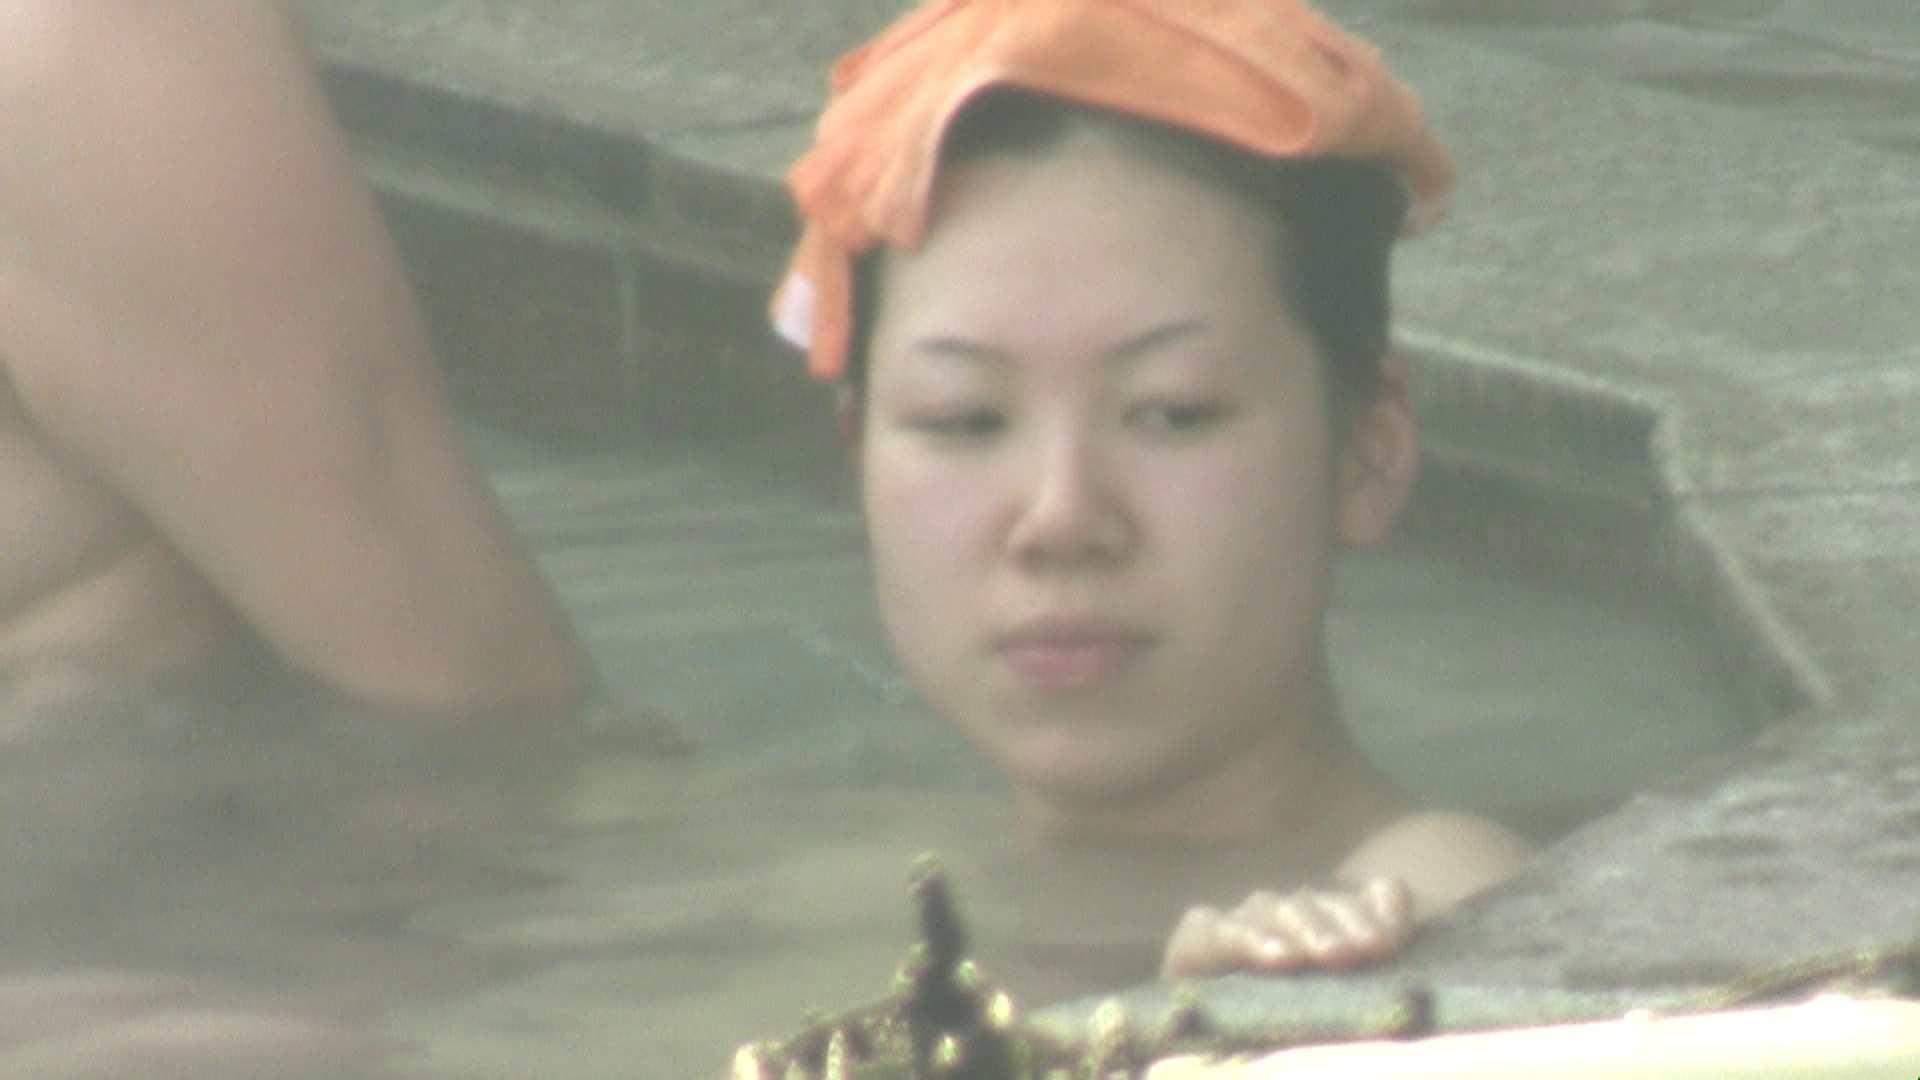 Aquaな露天風呂Vol.778 OL女体 | 露天  101連発 31